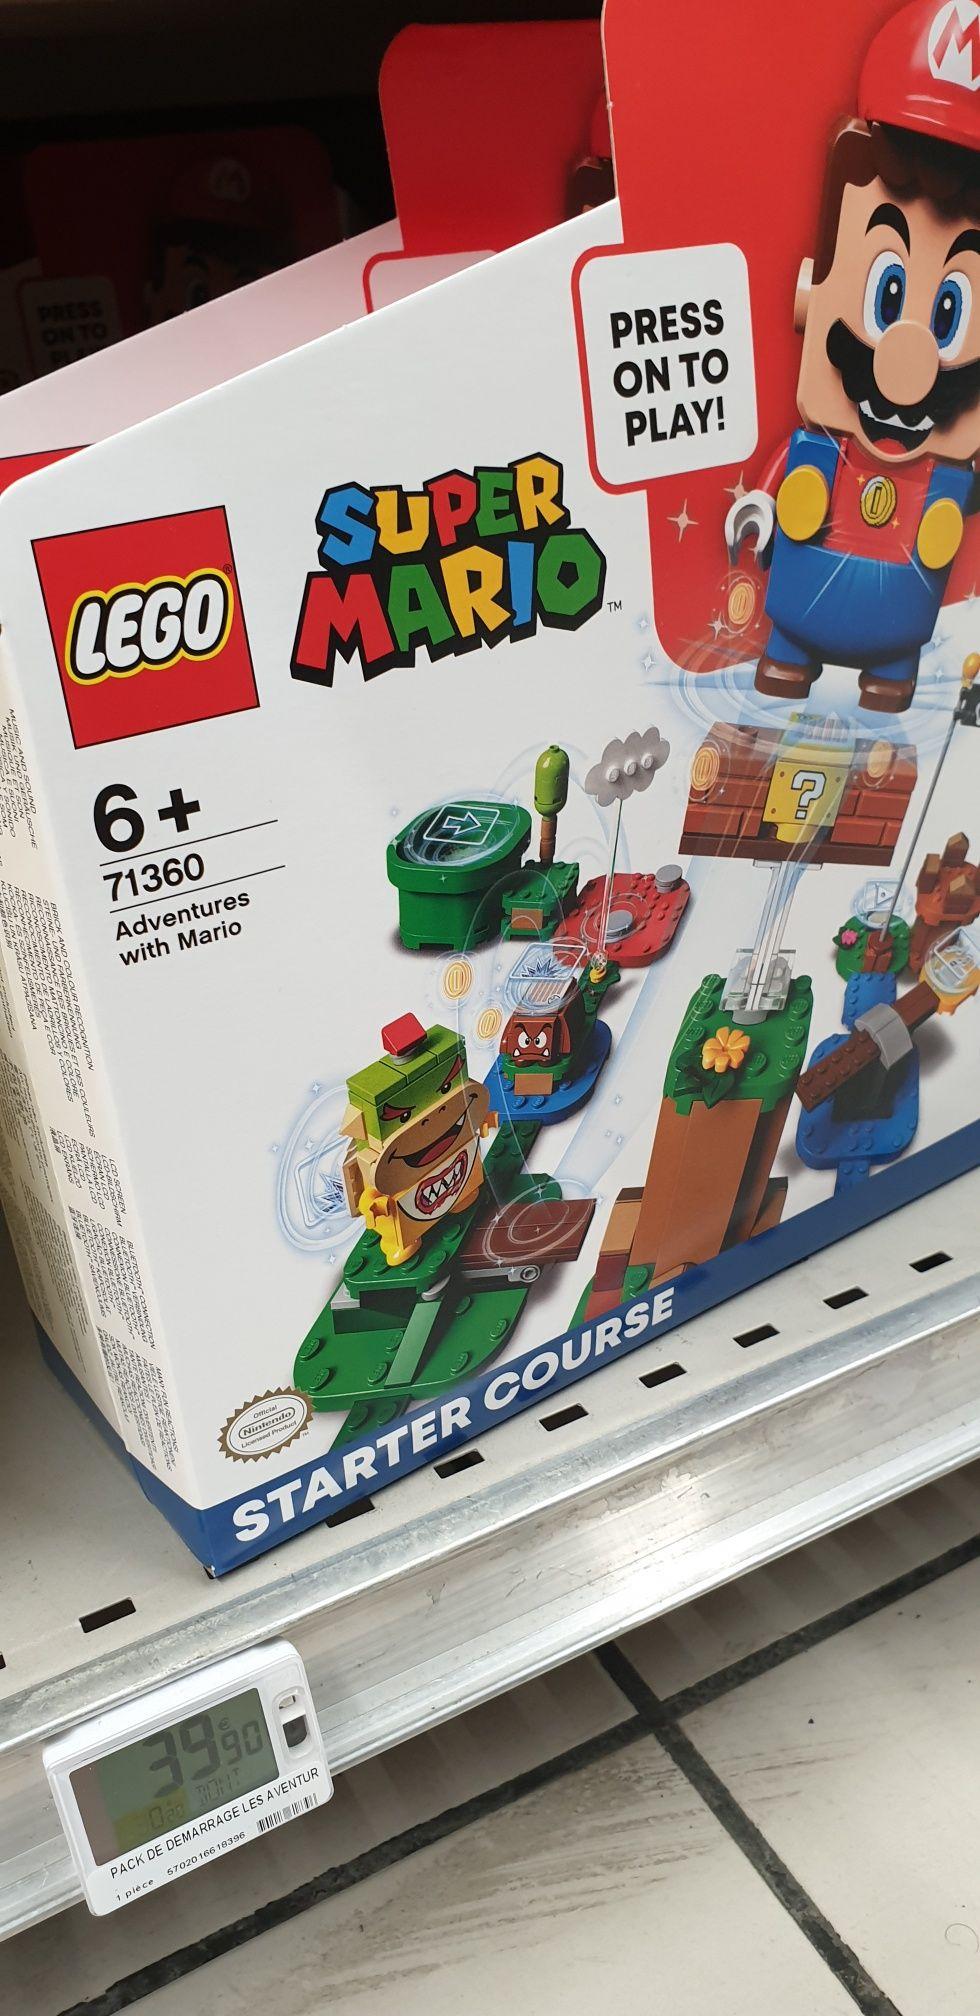 Jouet Lego Super Mario Starter Course - Cesson-Sévigné (35)